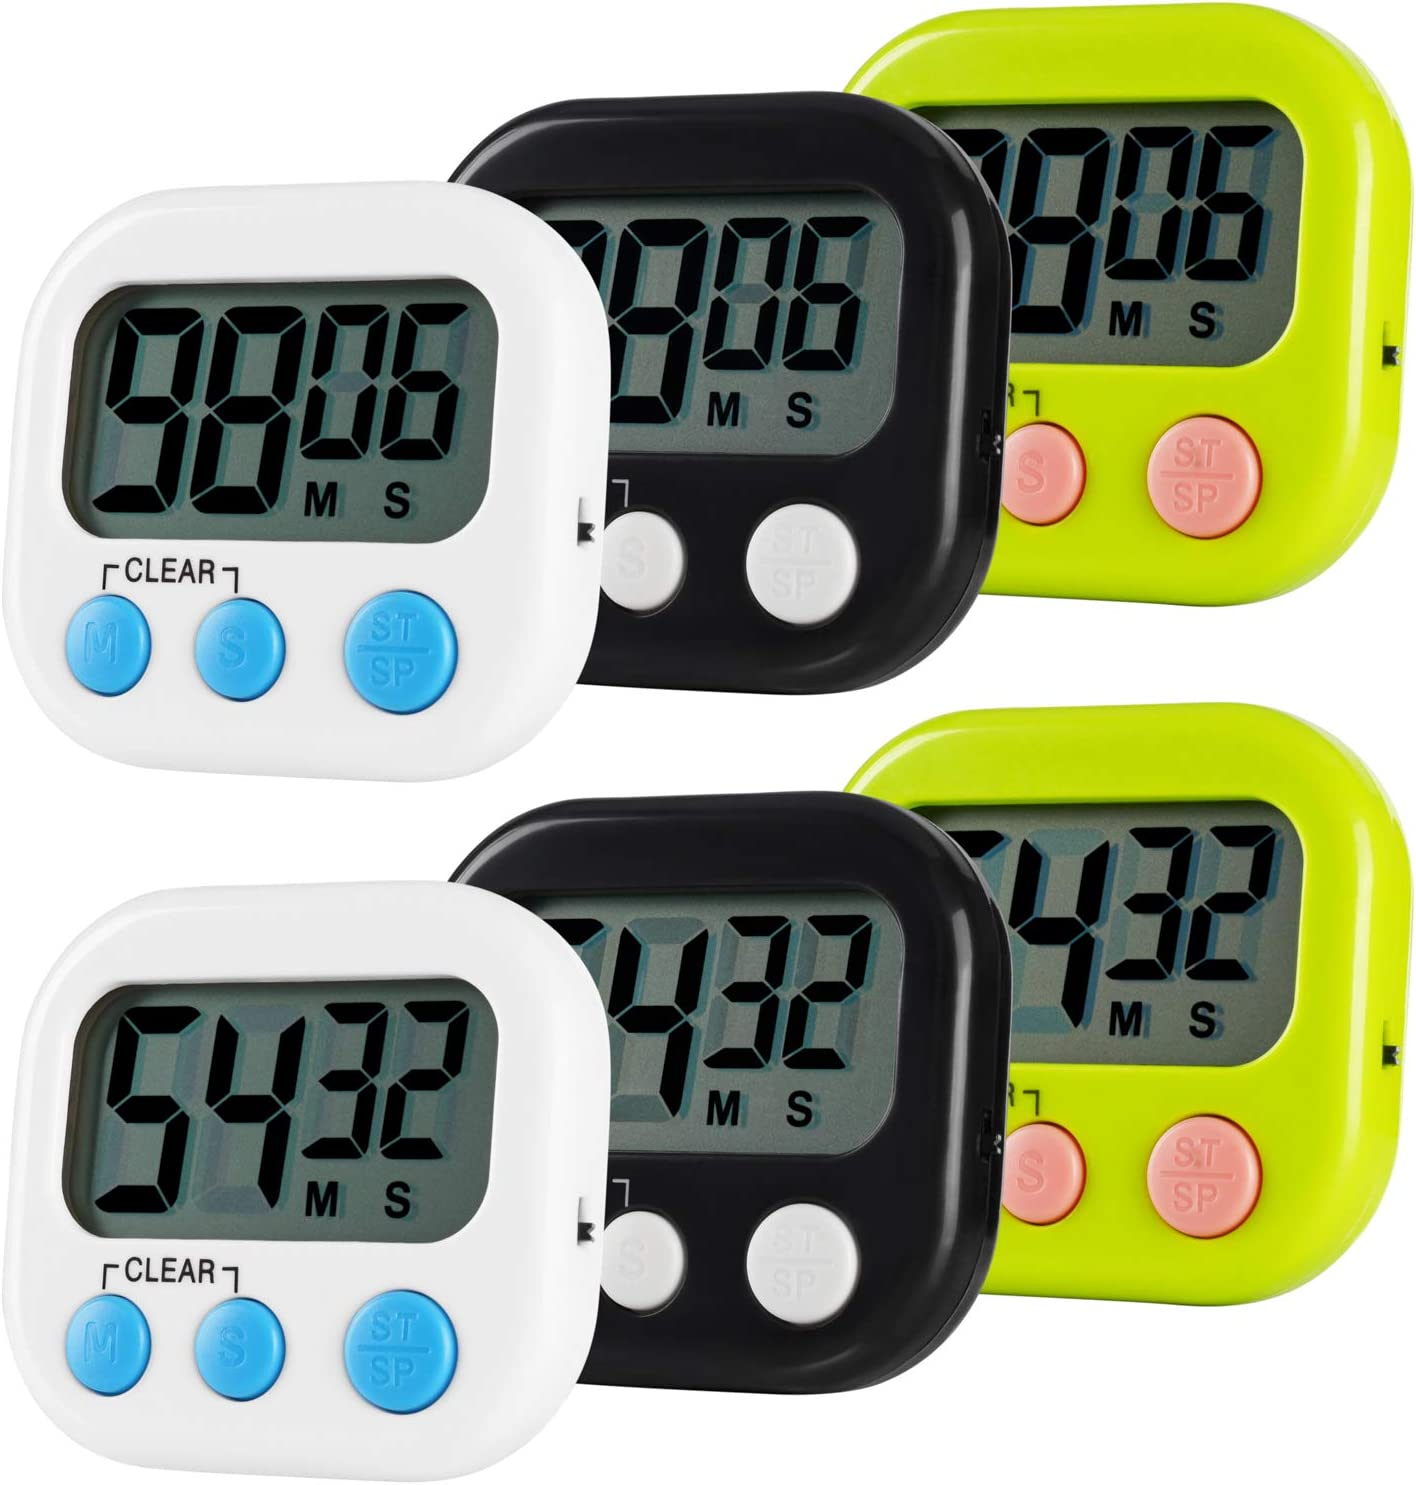 Jsdoin 6 Pack Digital Kitchen Timer Magnetic Back,Loud Alarm, Countdown Timer Management,for Cooking Baking Sports Games Office